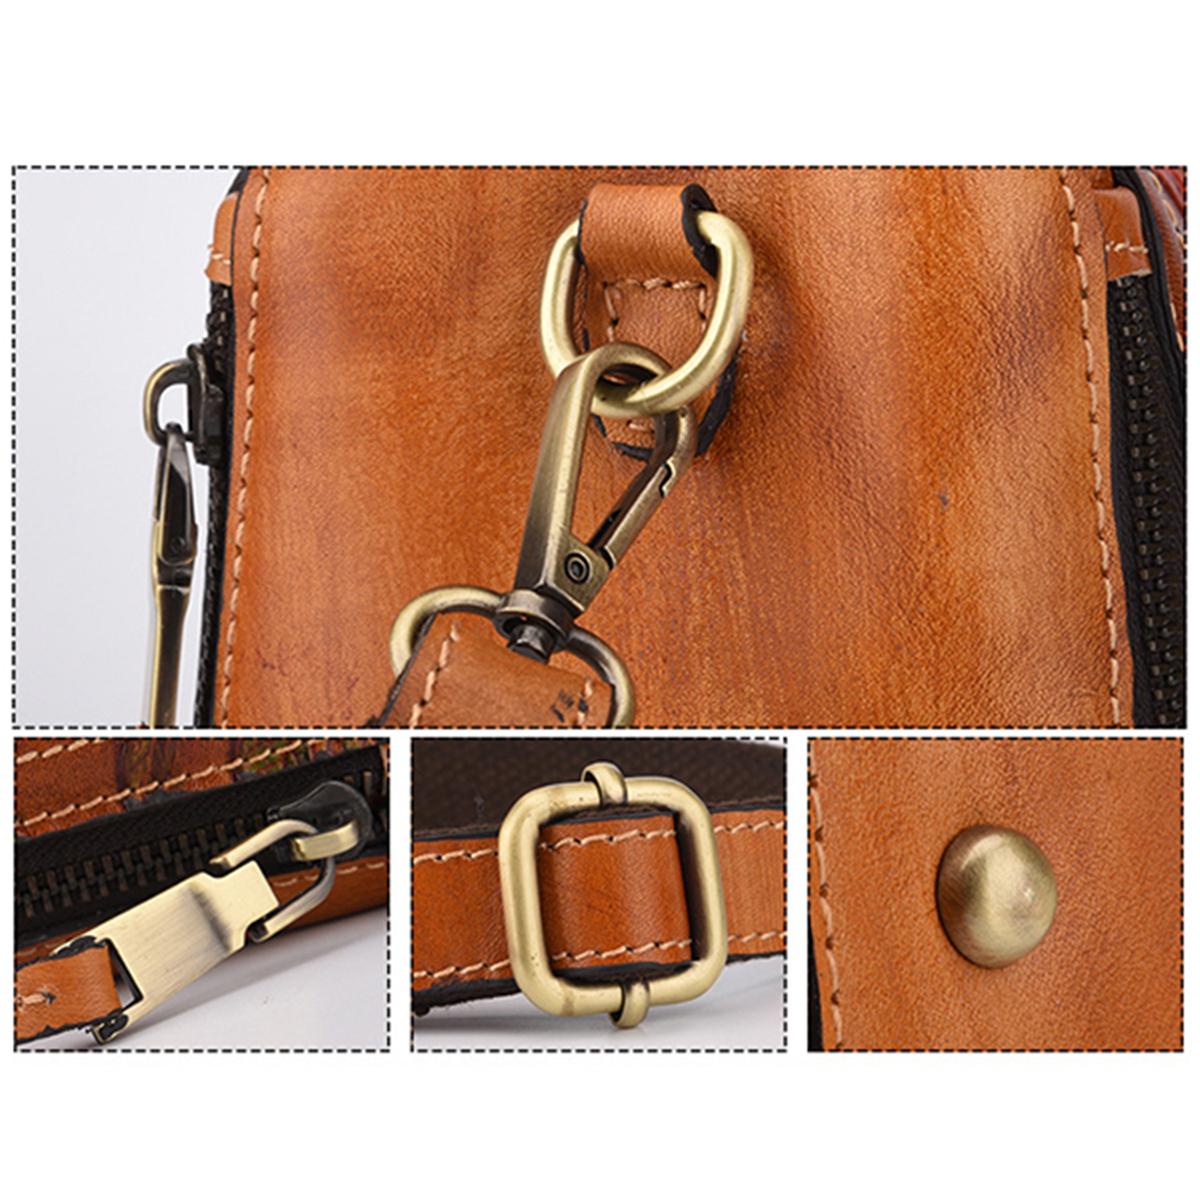 Brenice Women Genuine Leather Hand Embossed Crossbody Bag